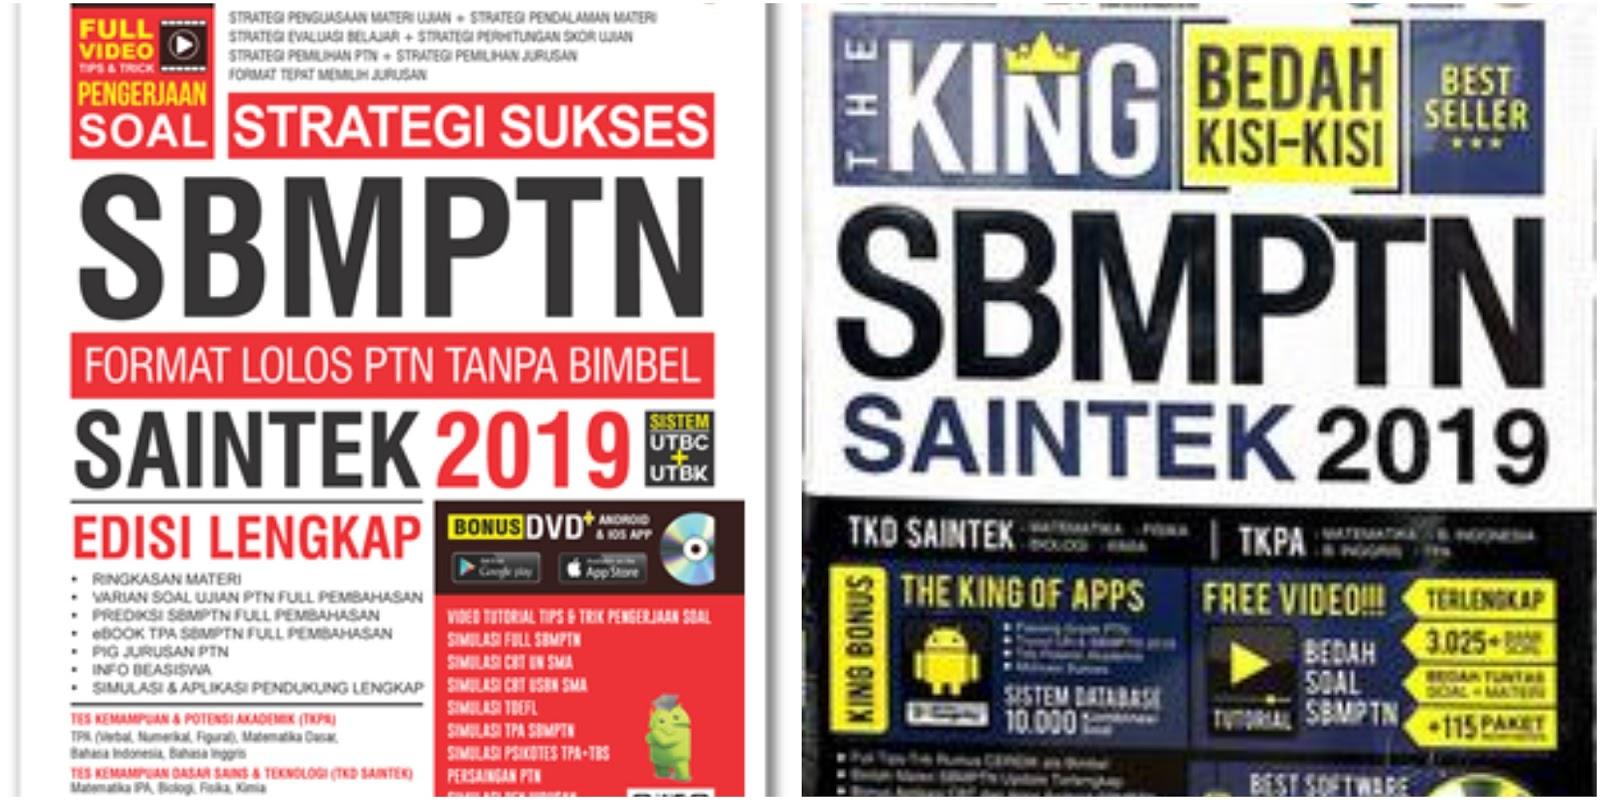 Pembahasan Soal SBMPTN Saintek 2019 (TKD dan TKPA)